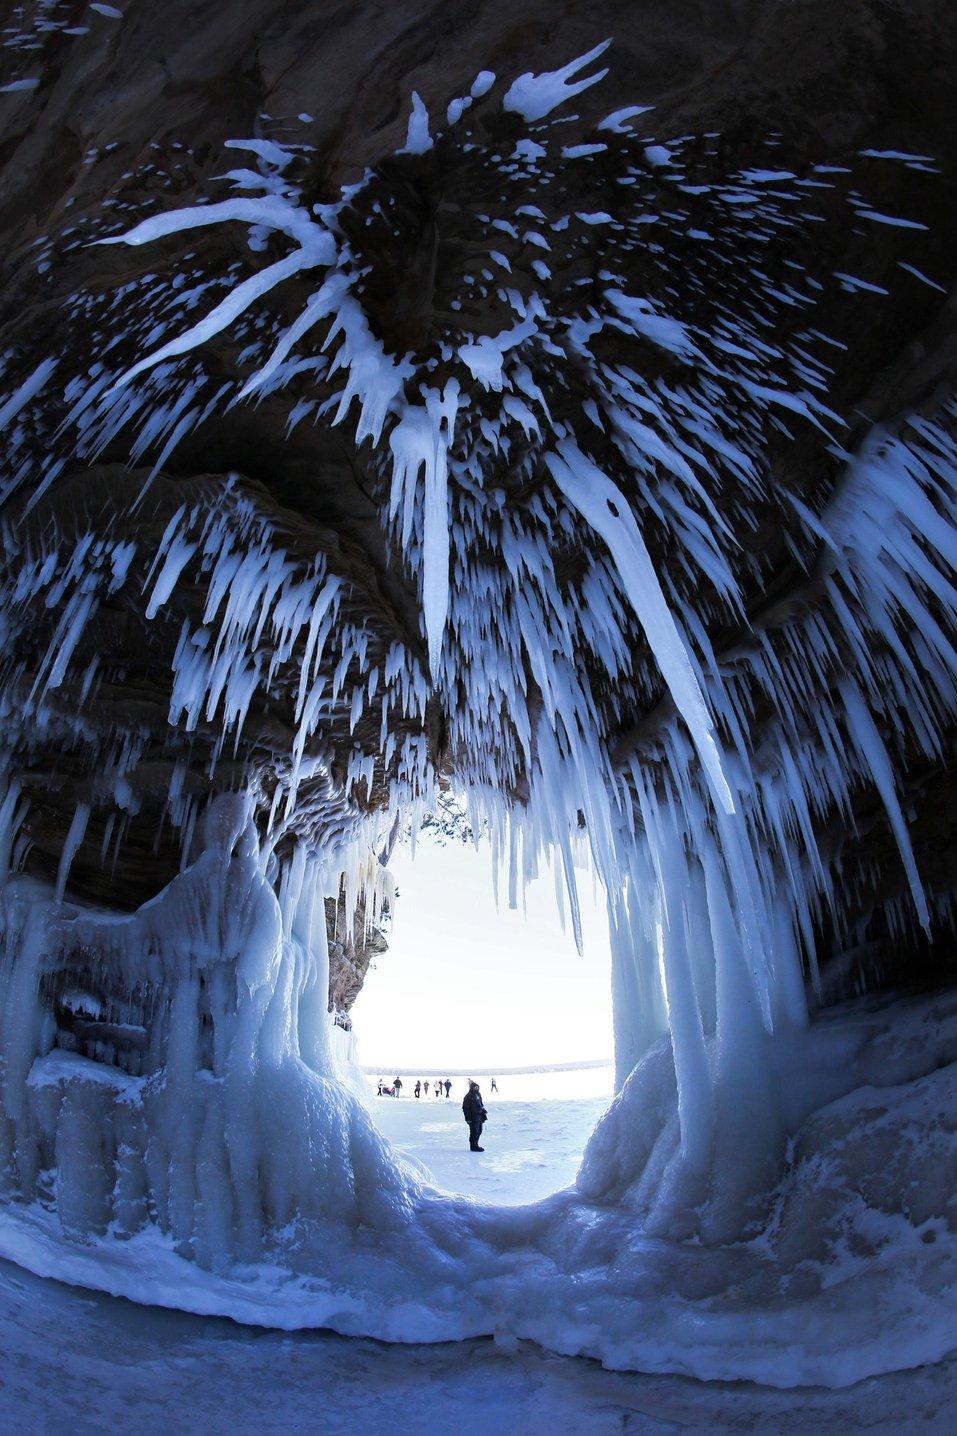 la-ice-caves-20140217-photos-005.jpeg